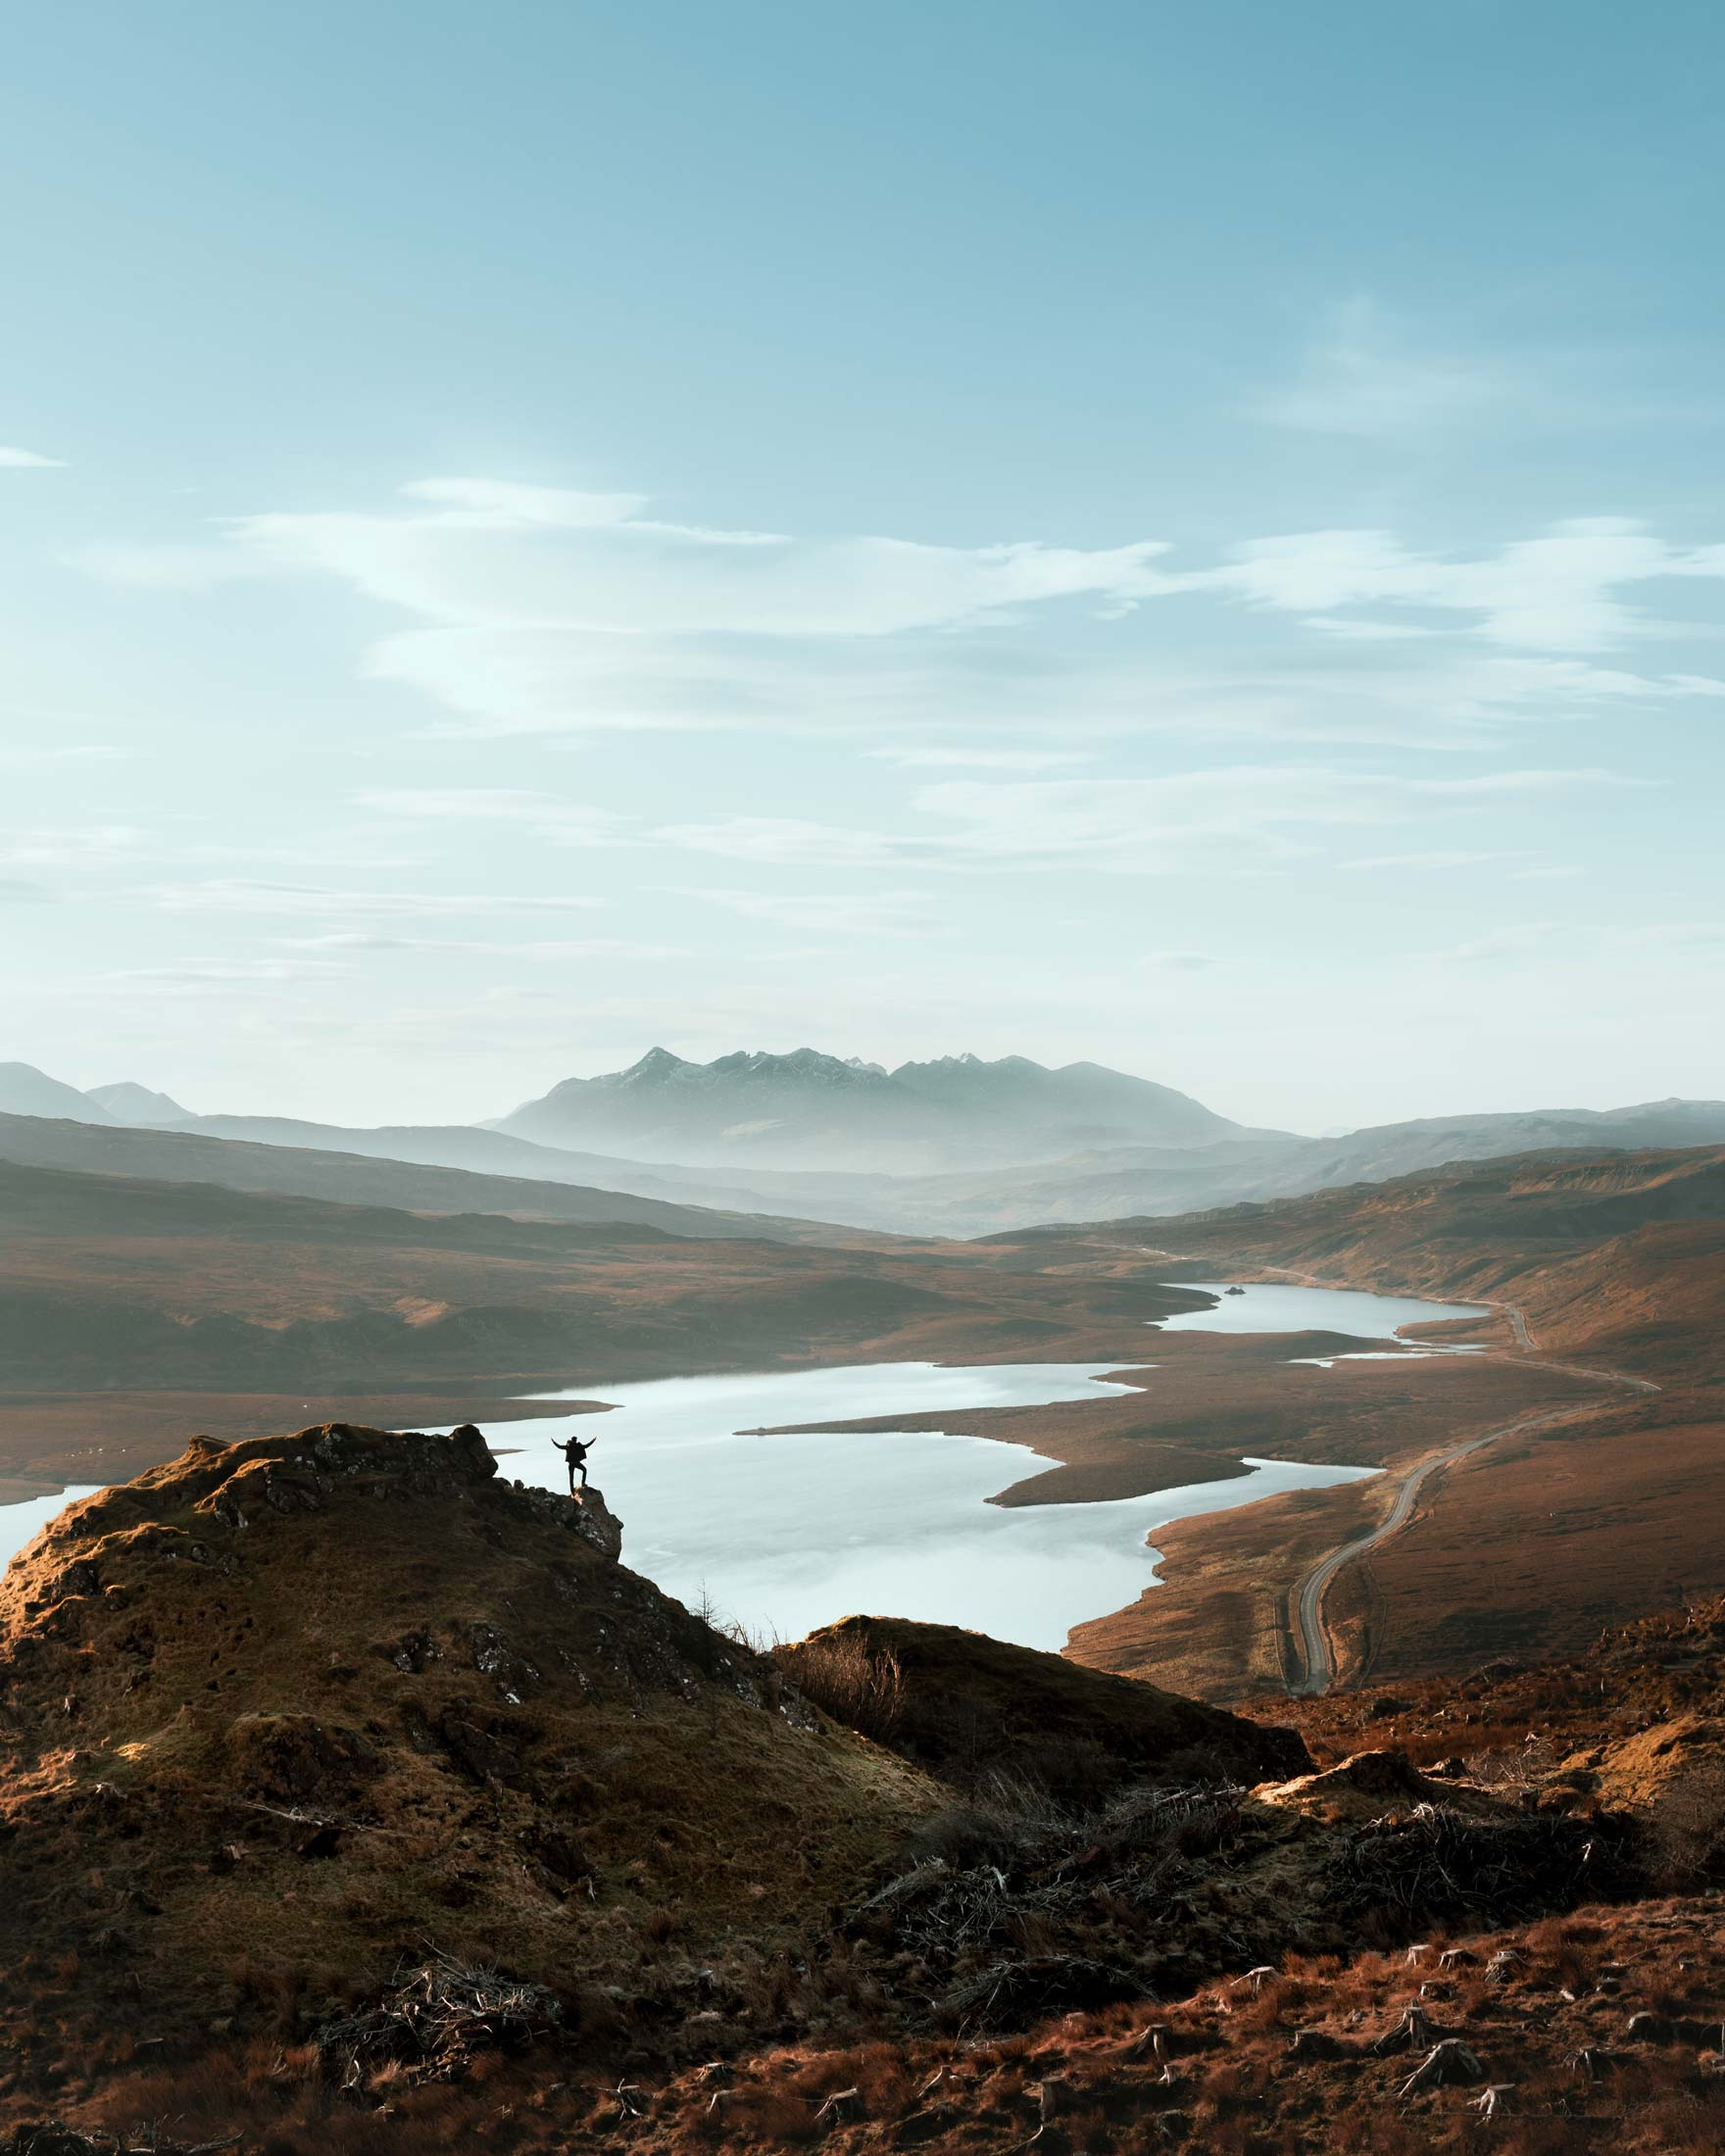 Fotoreis Schotland | ROCKY ROADS TRAVEL